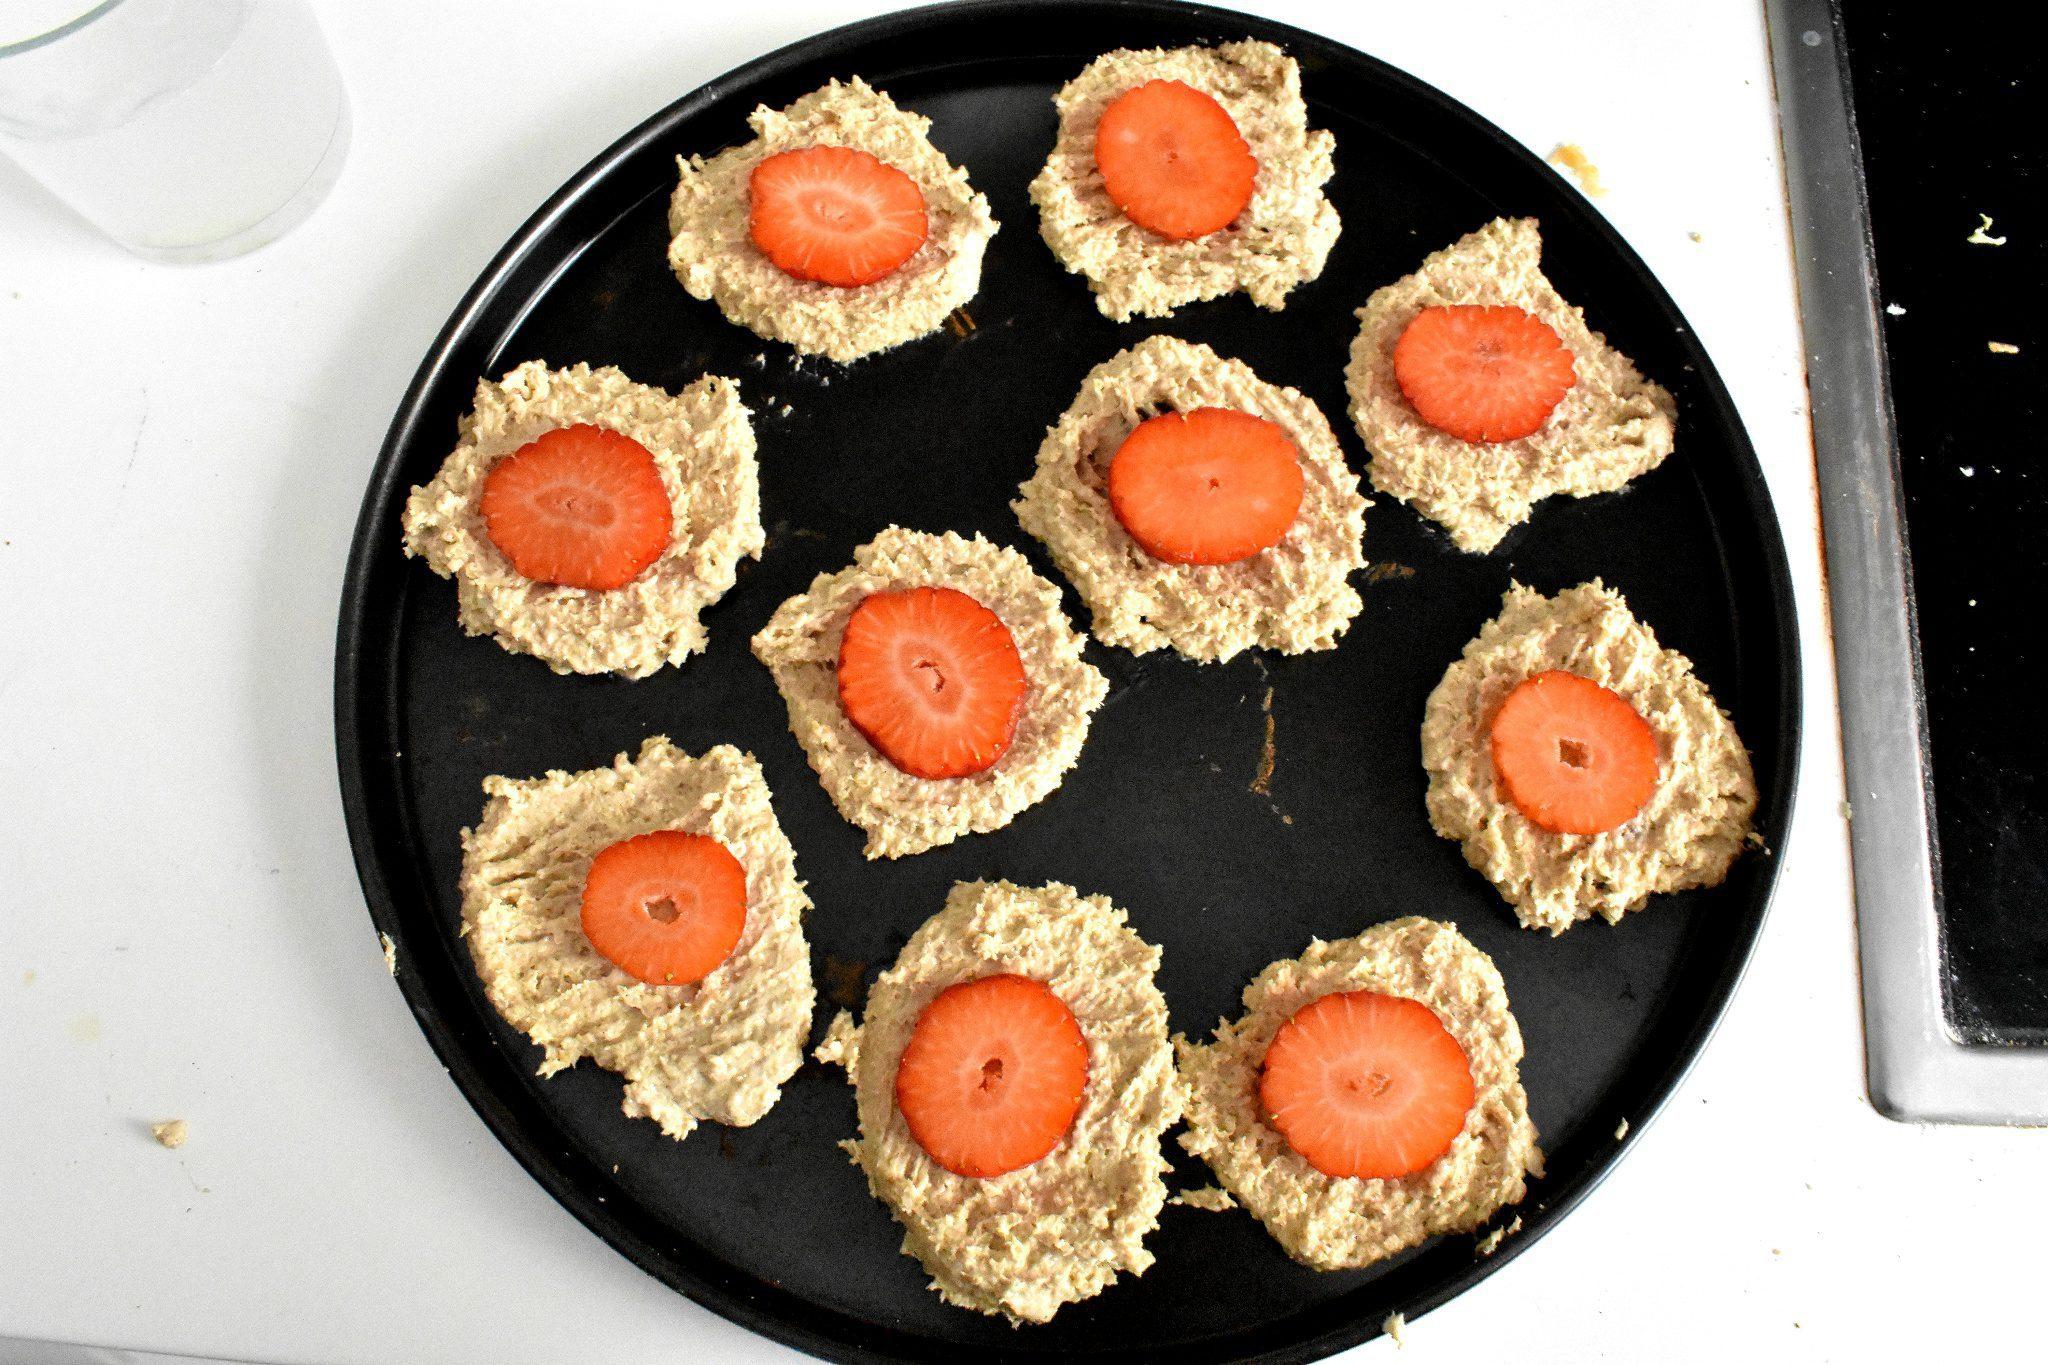 Healthy-oatmeal-cookies-recipe-strawberry-process-3-SunCakeMom